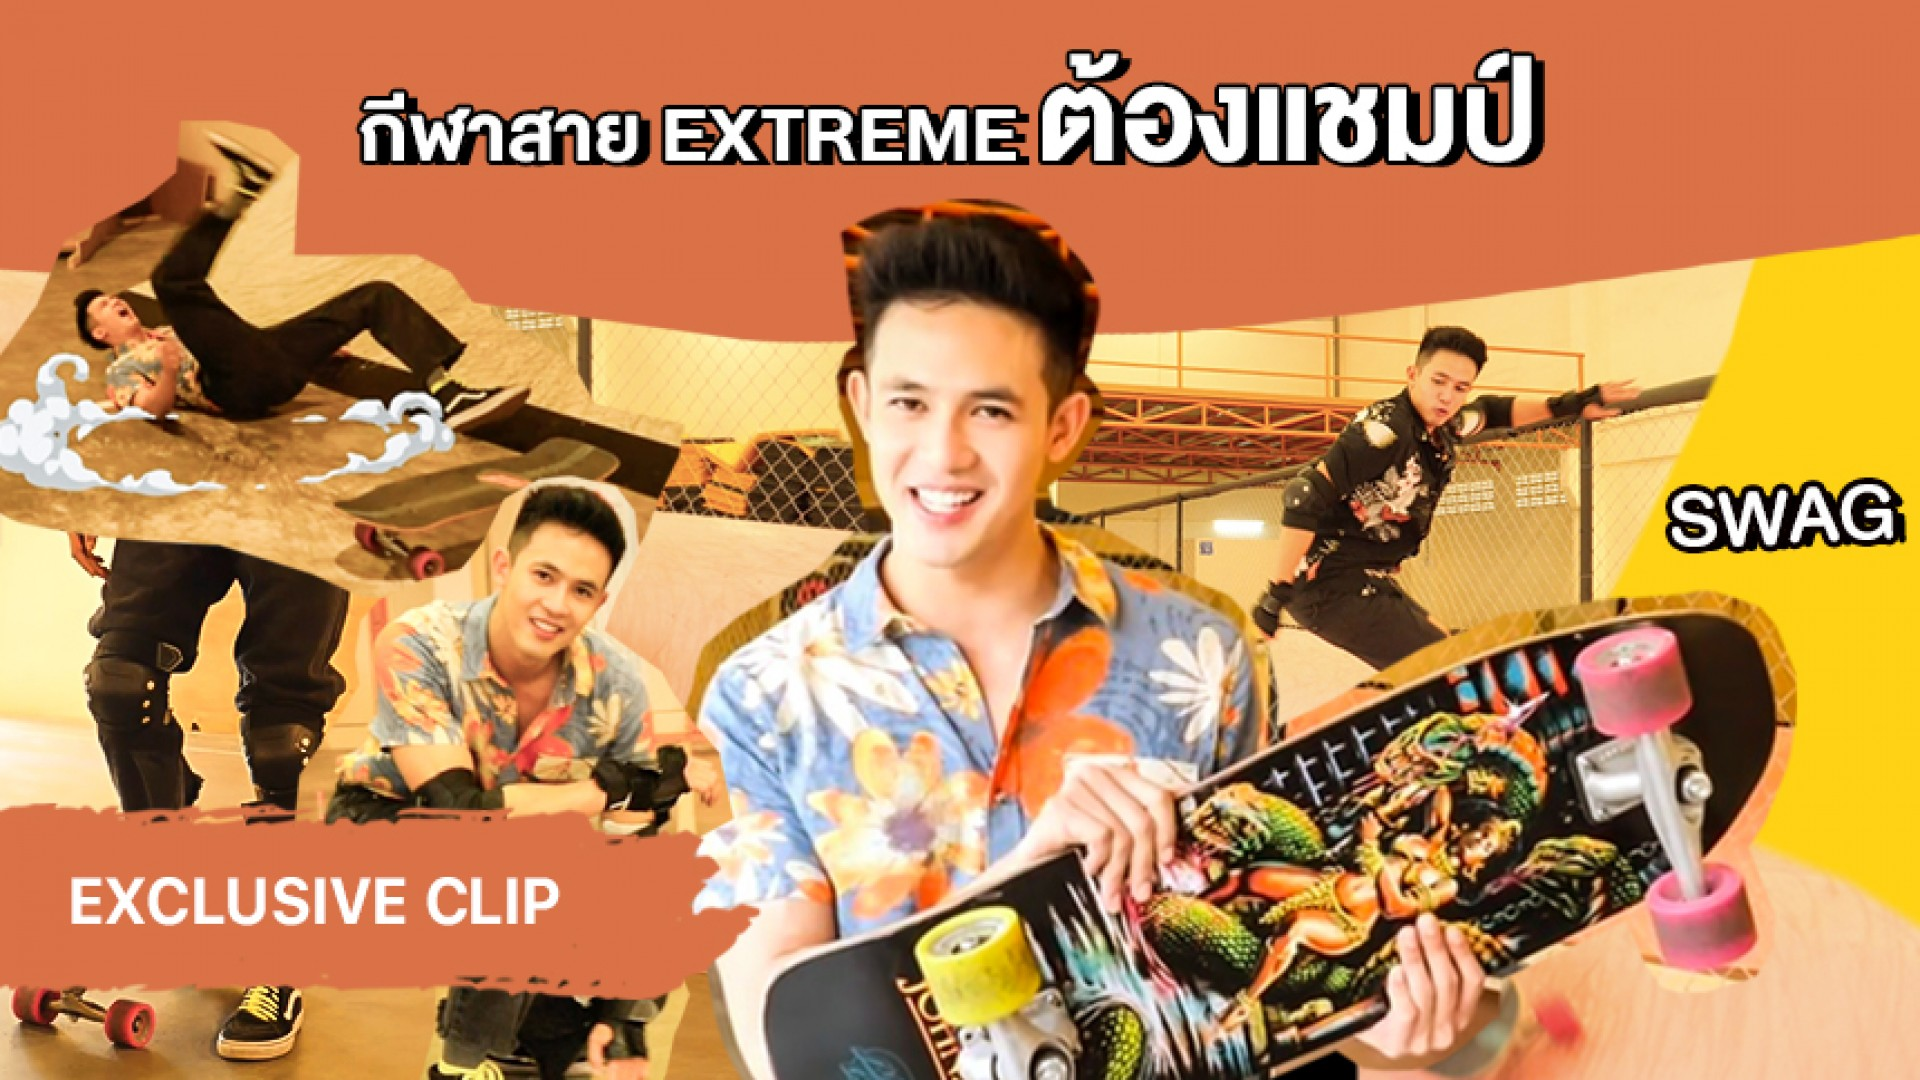 Exclusive clip by แชมป์ ชนาธิป